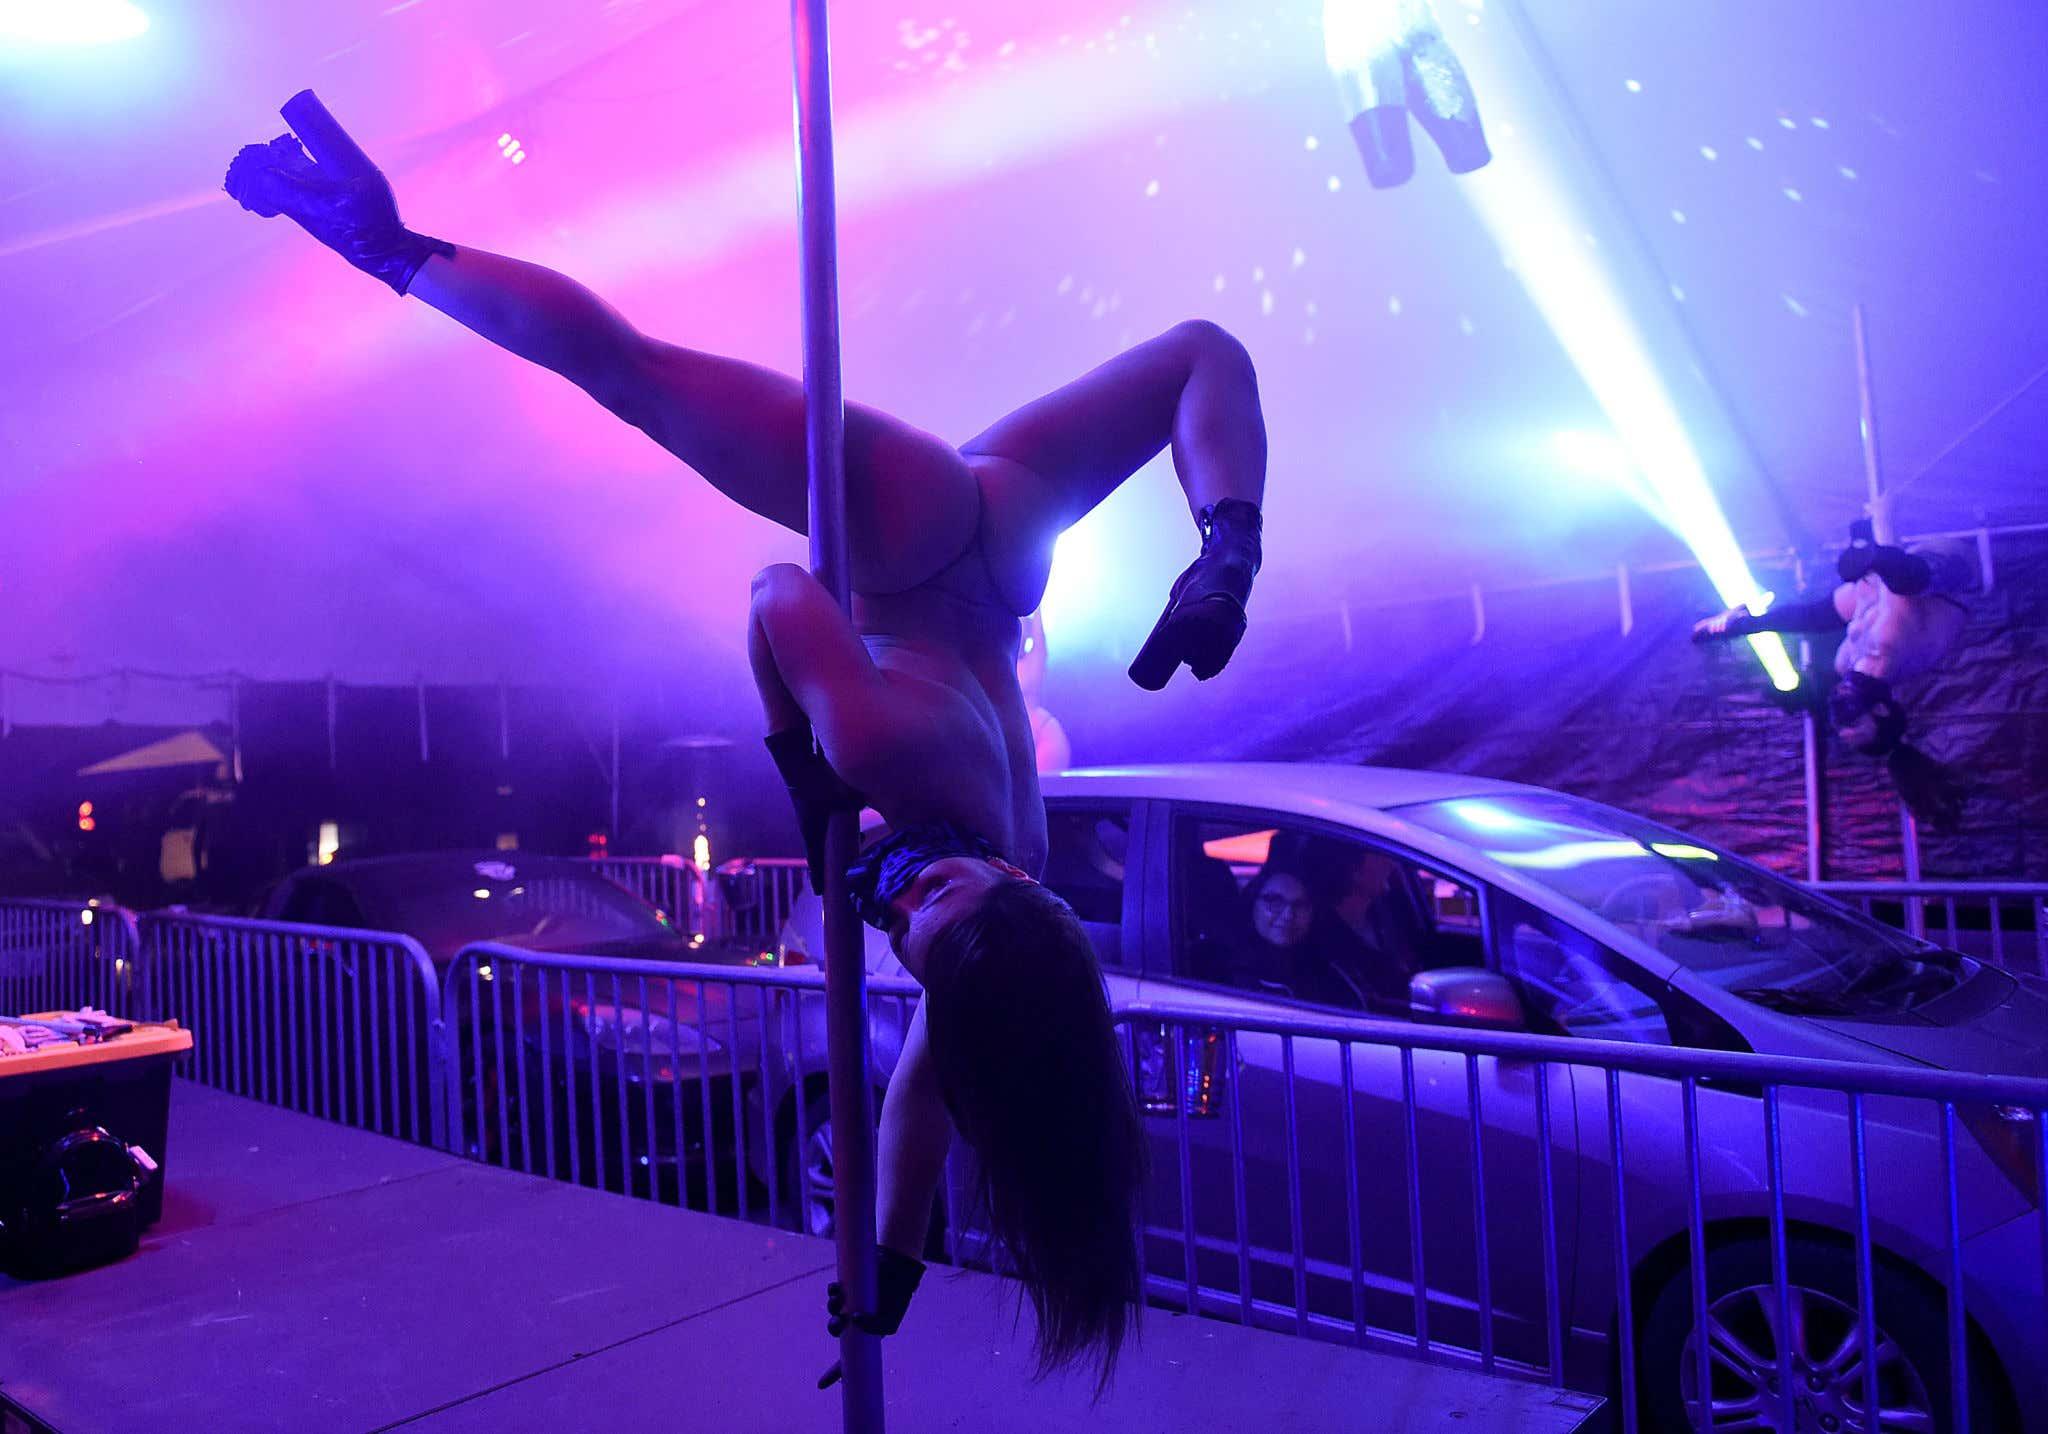 Strip Club Offers Drive Thru Dances During Coronavirus Pandemic